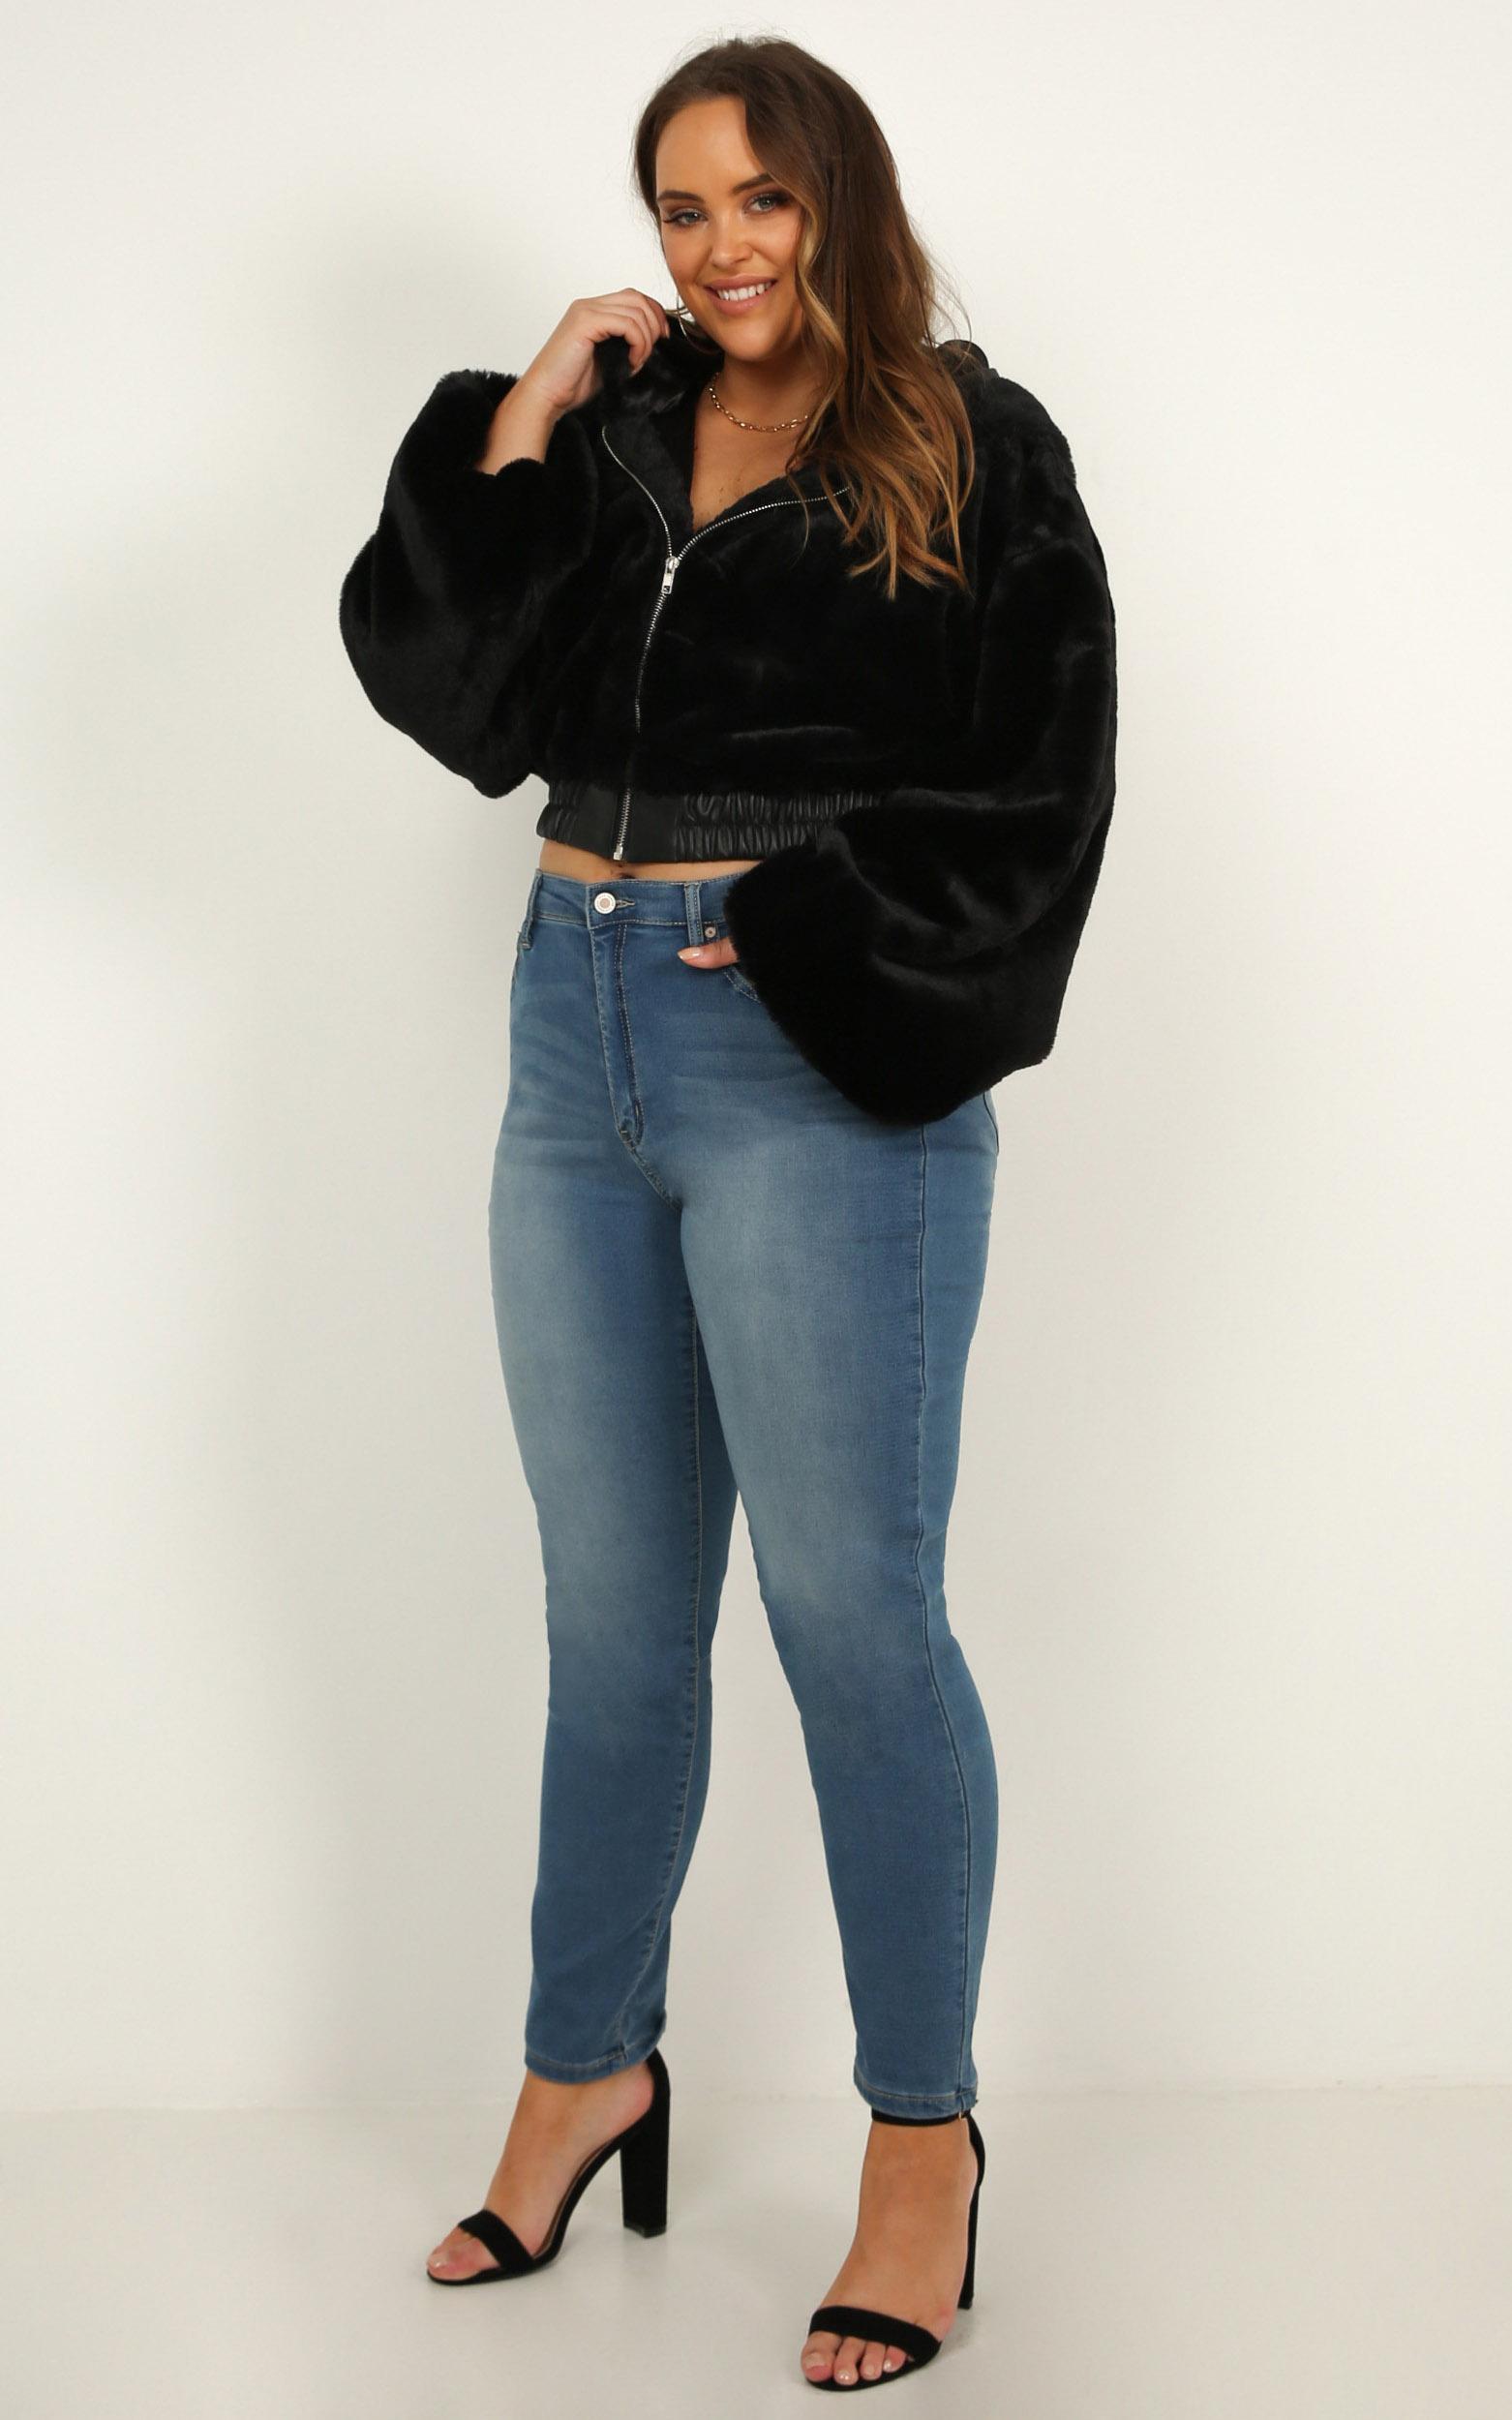 SnowBound Jacket in black faux fur - 14 (XL), Black, hi-res image number null